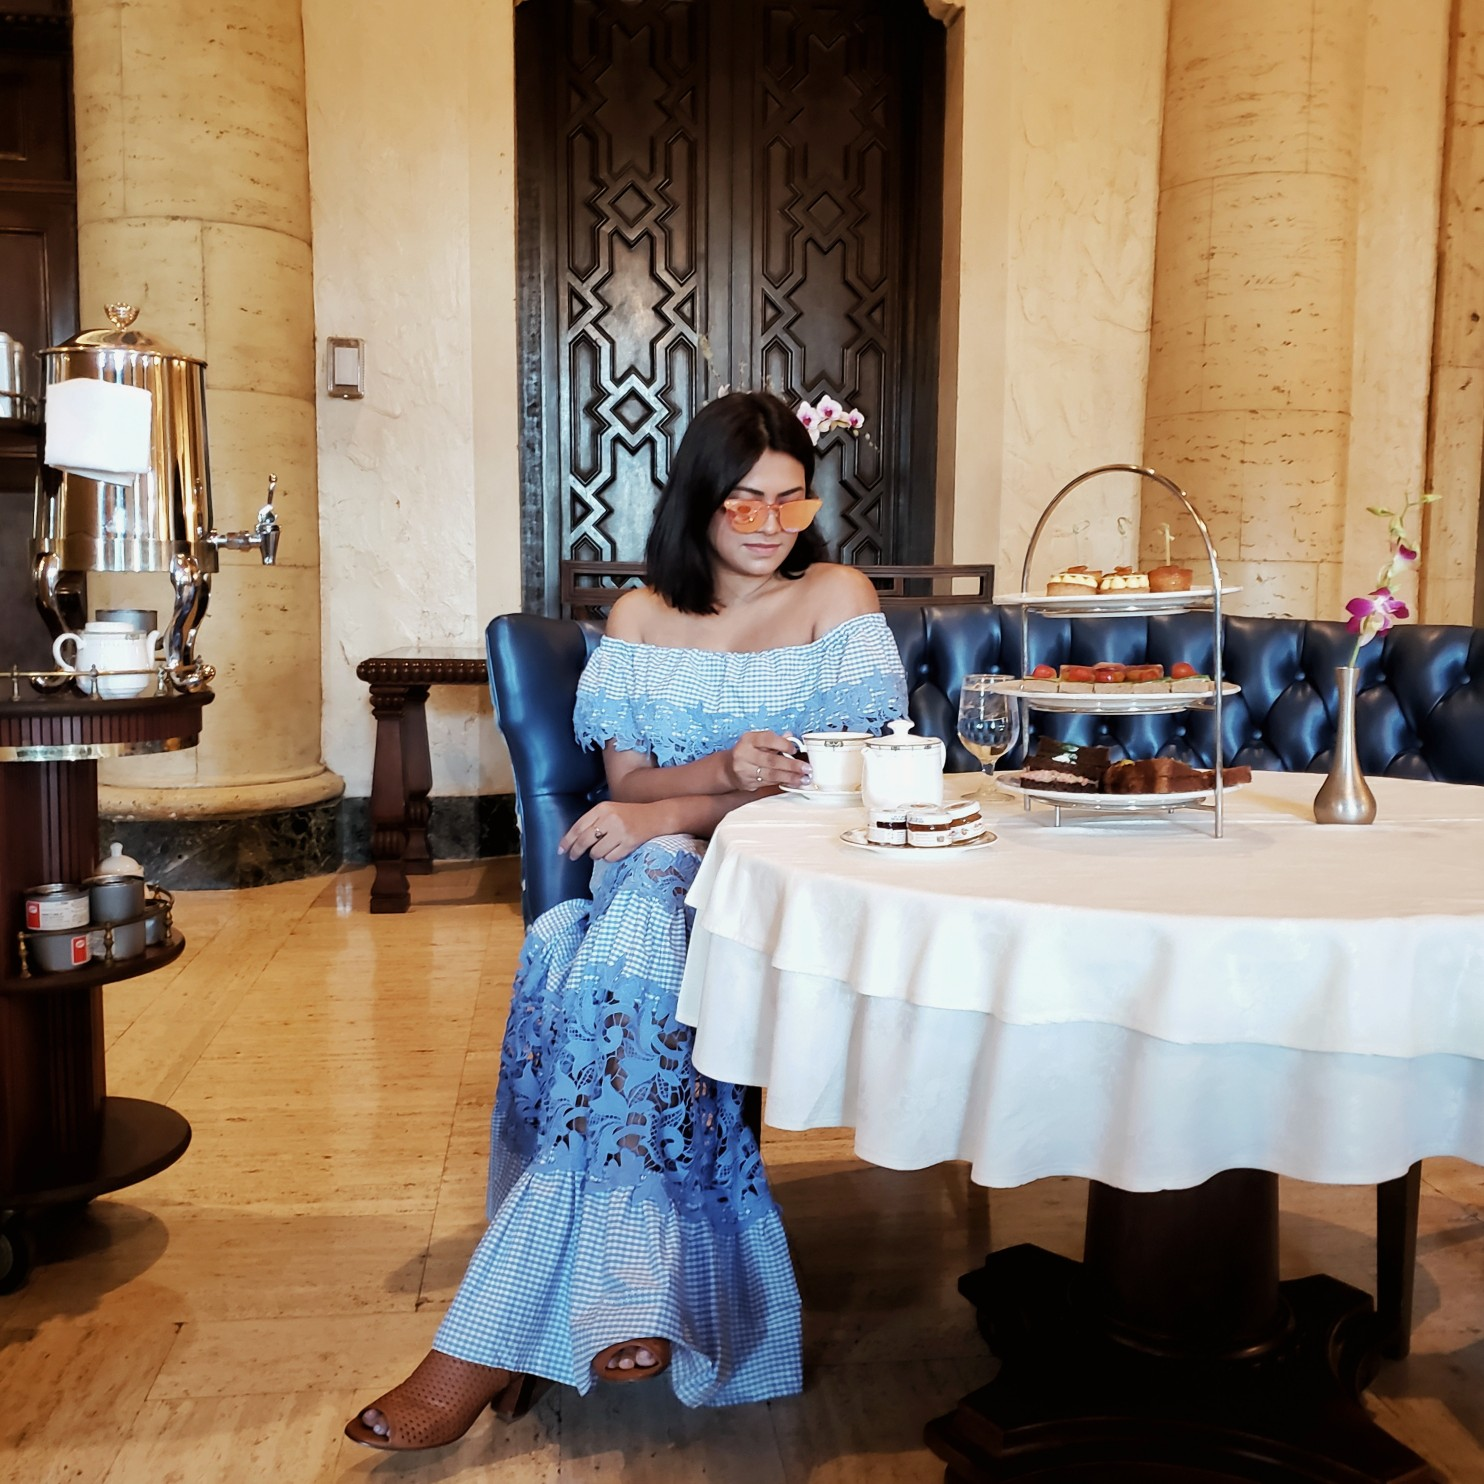 Miami Fashion blogger wearing gingham dorothy maxi dress from Venus having High tea at biltmore hotel miami Coral Gables